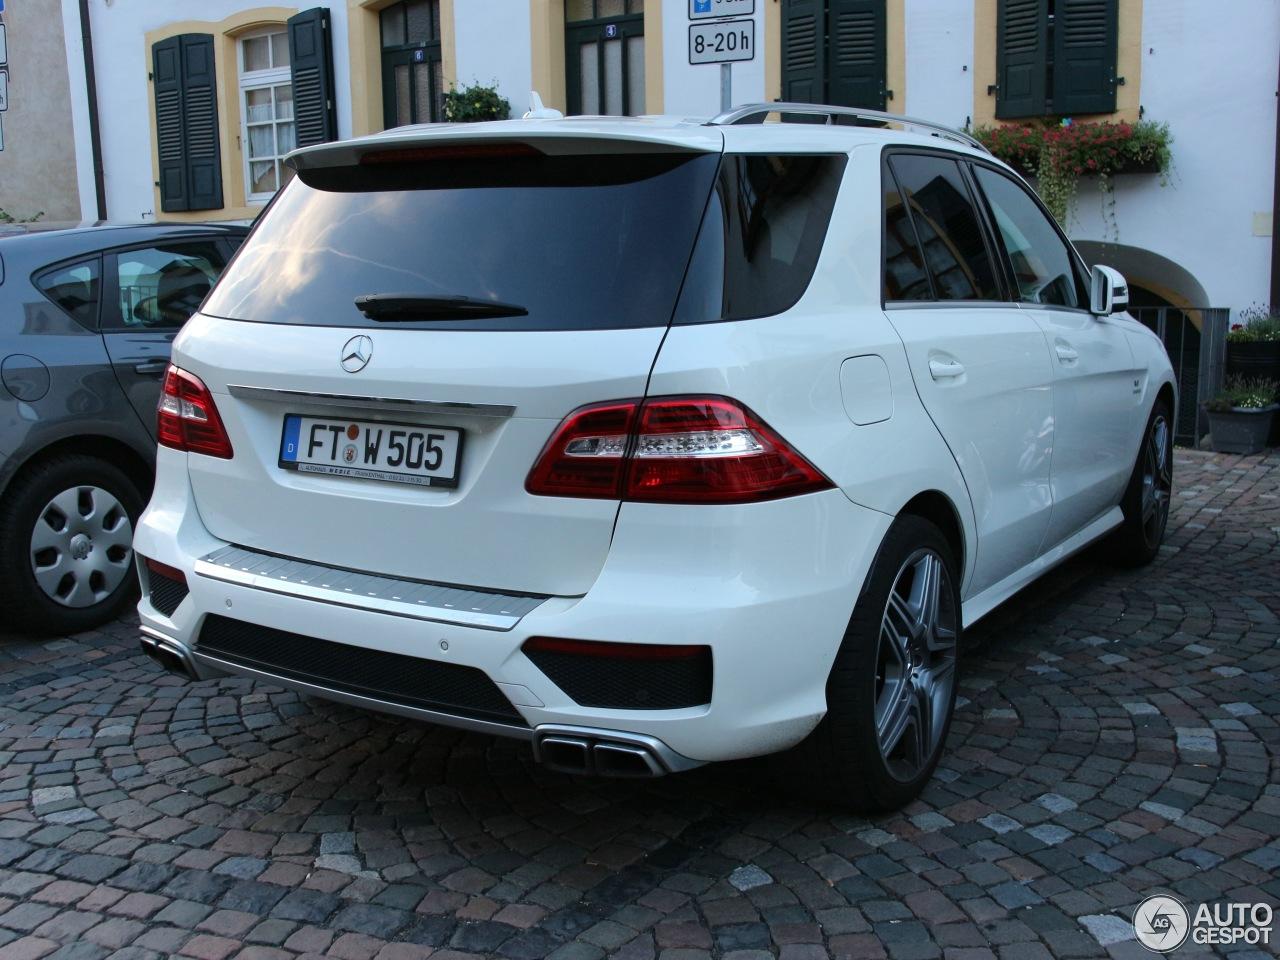 Mercedes benz ml 63 amg w166 18 july 2017 autogespot for Mercedes benz ml 2017